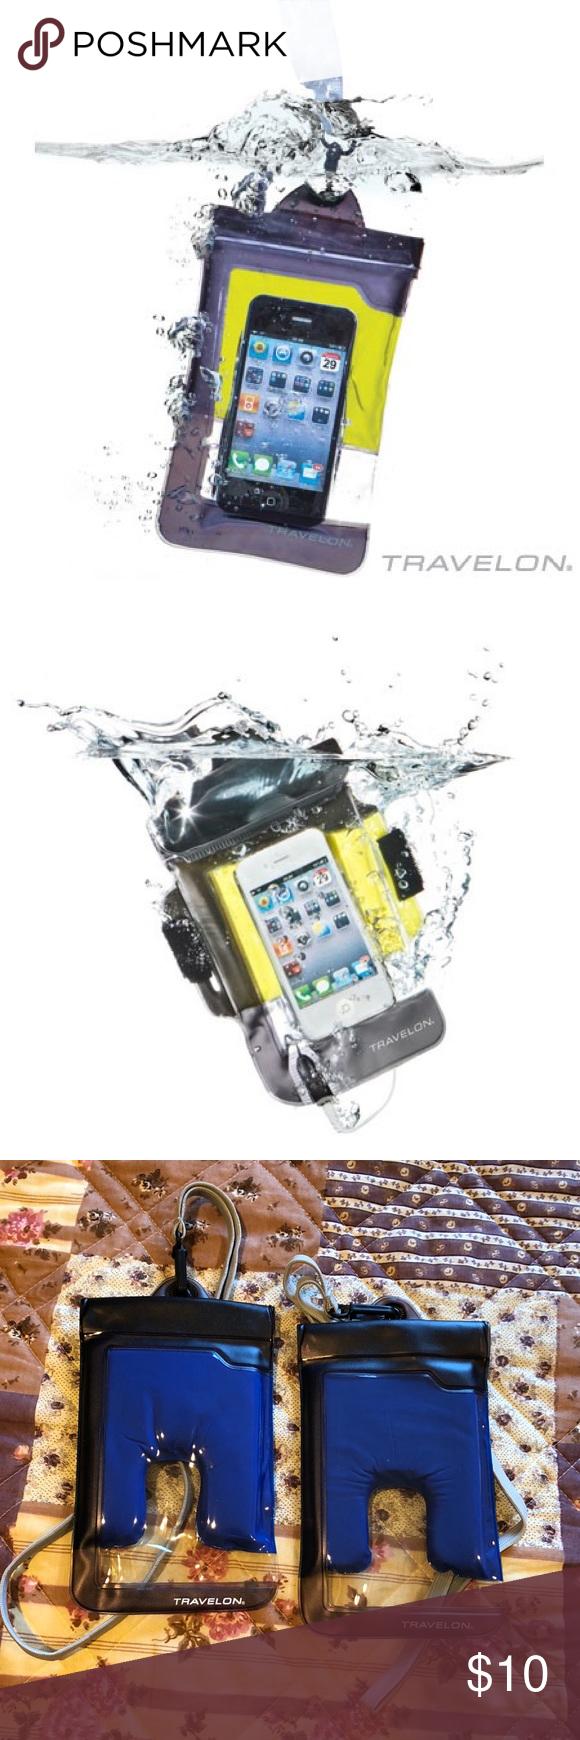 FREE W/ PURCHASE! Waterproof Smart Phone Case Phone